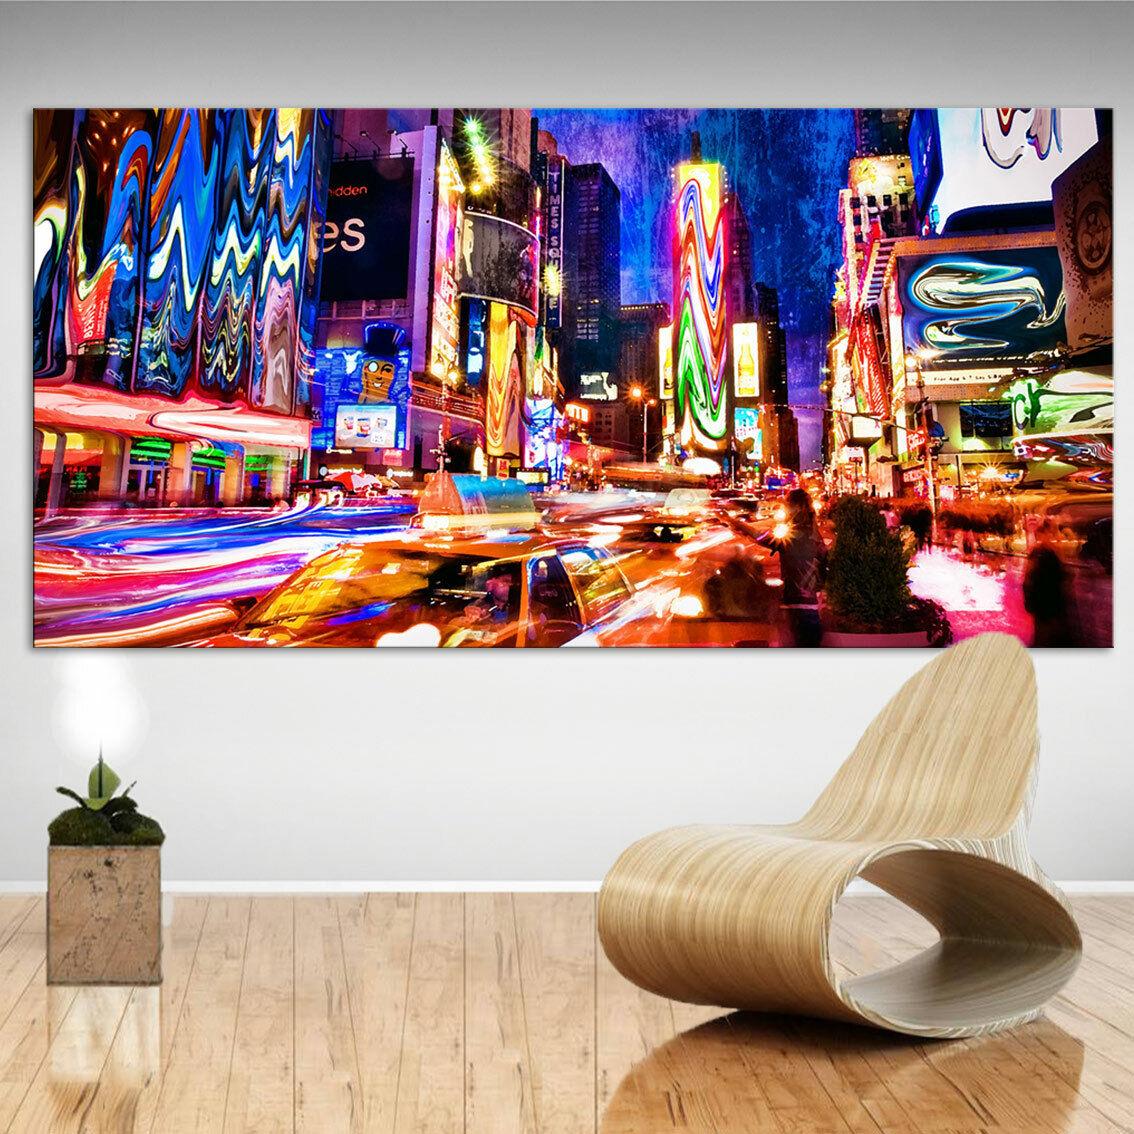 Skyline New York Buntes Bild Leinwand Abstrakte Kunst Bilder Wandbilder D2075